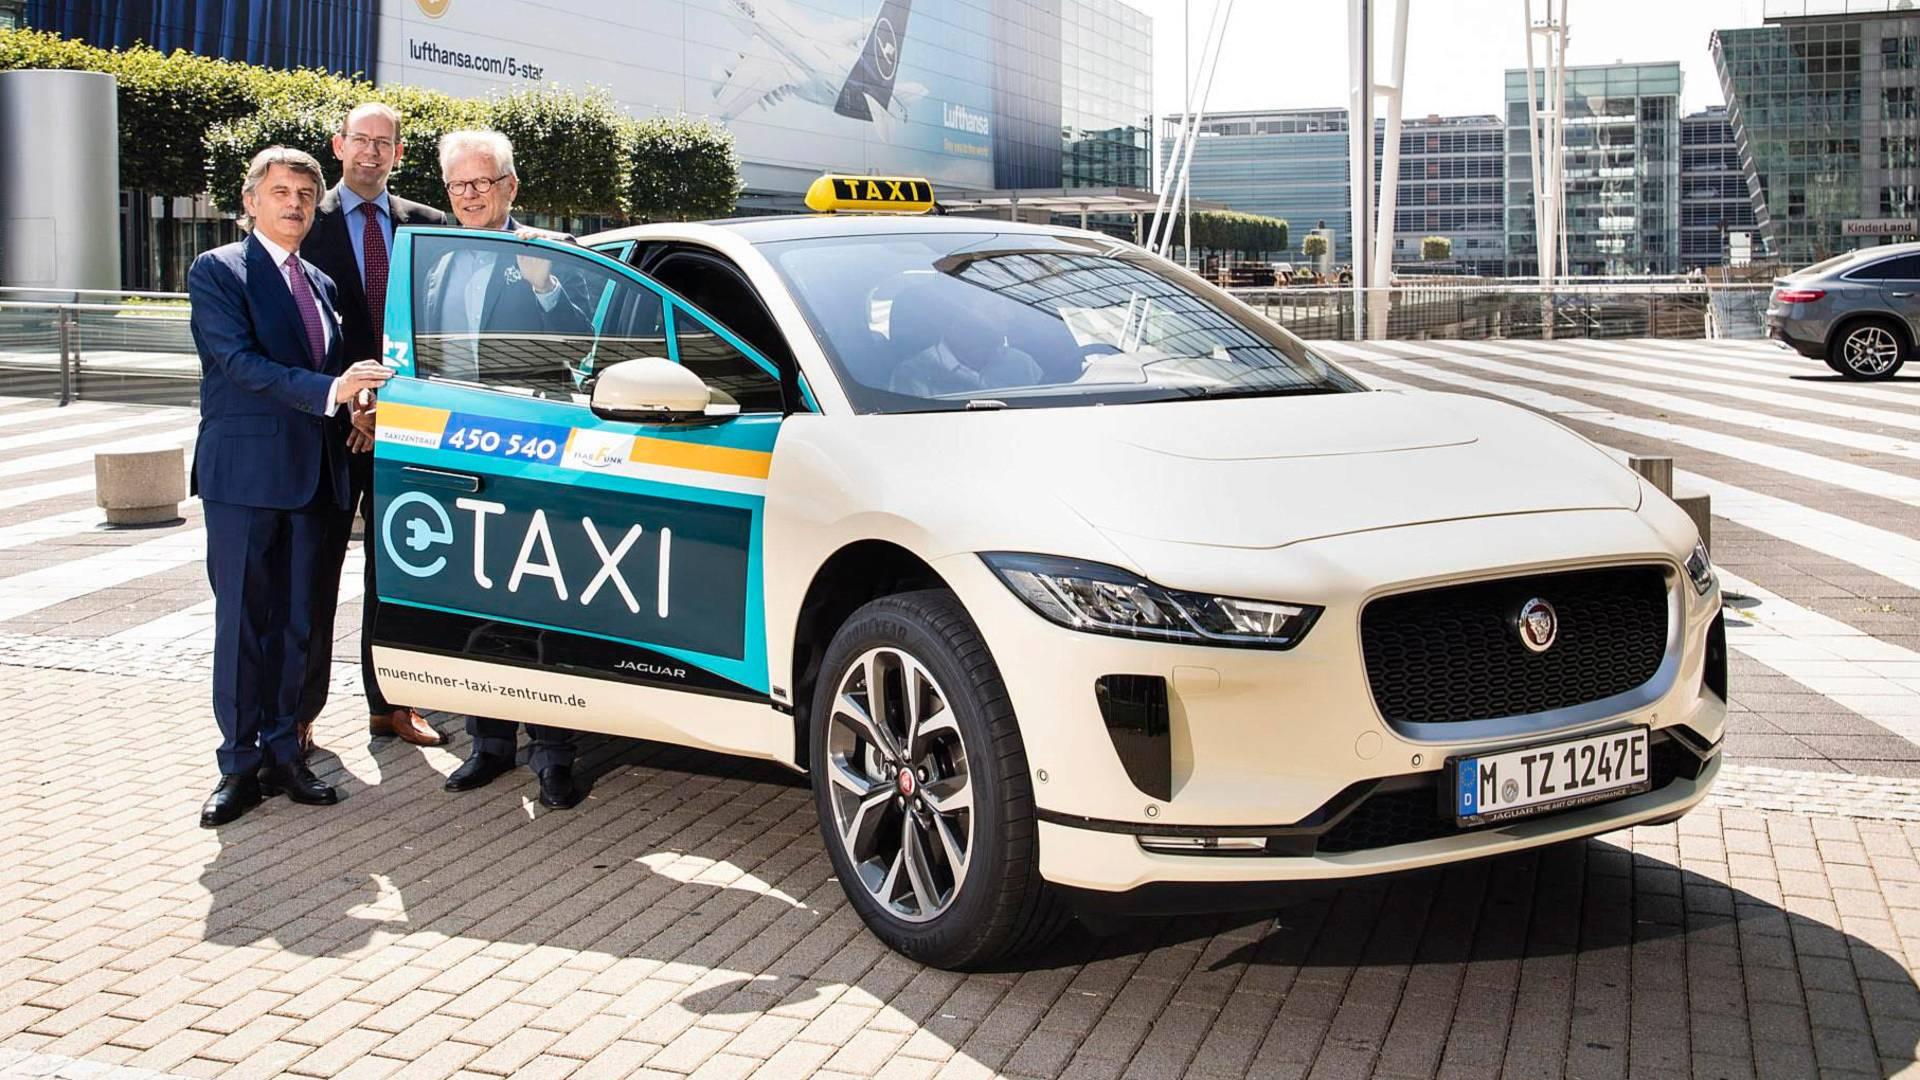 Электрокар Jaguar I-Pace стал автомобилем такси в Германии 1